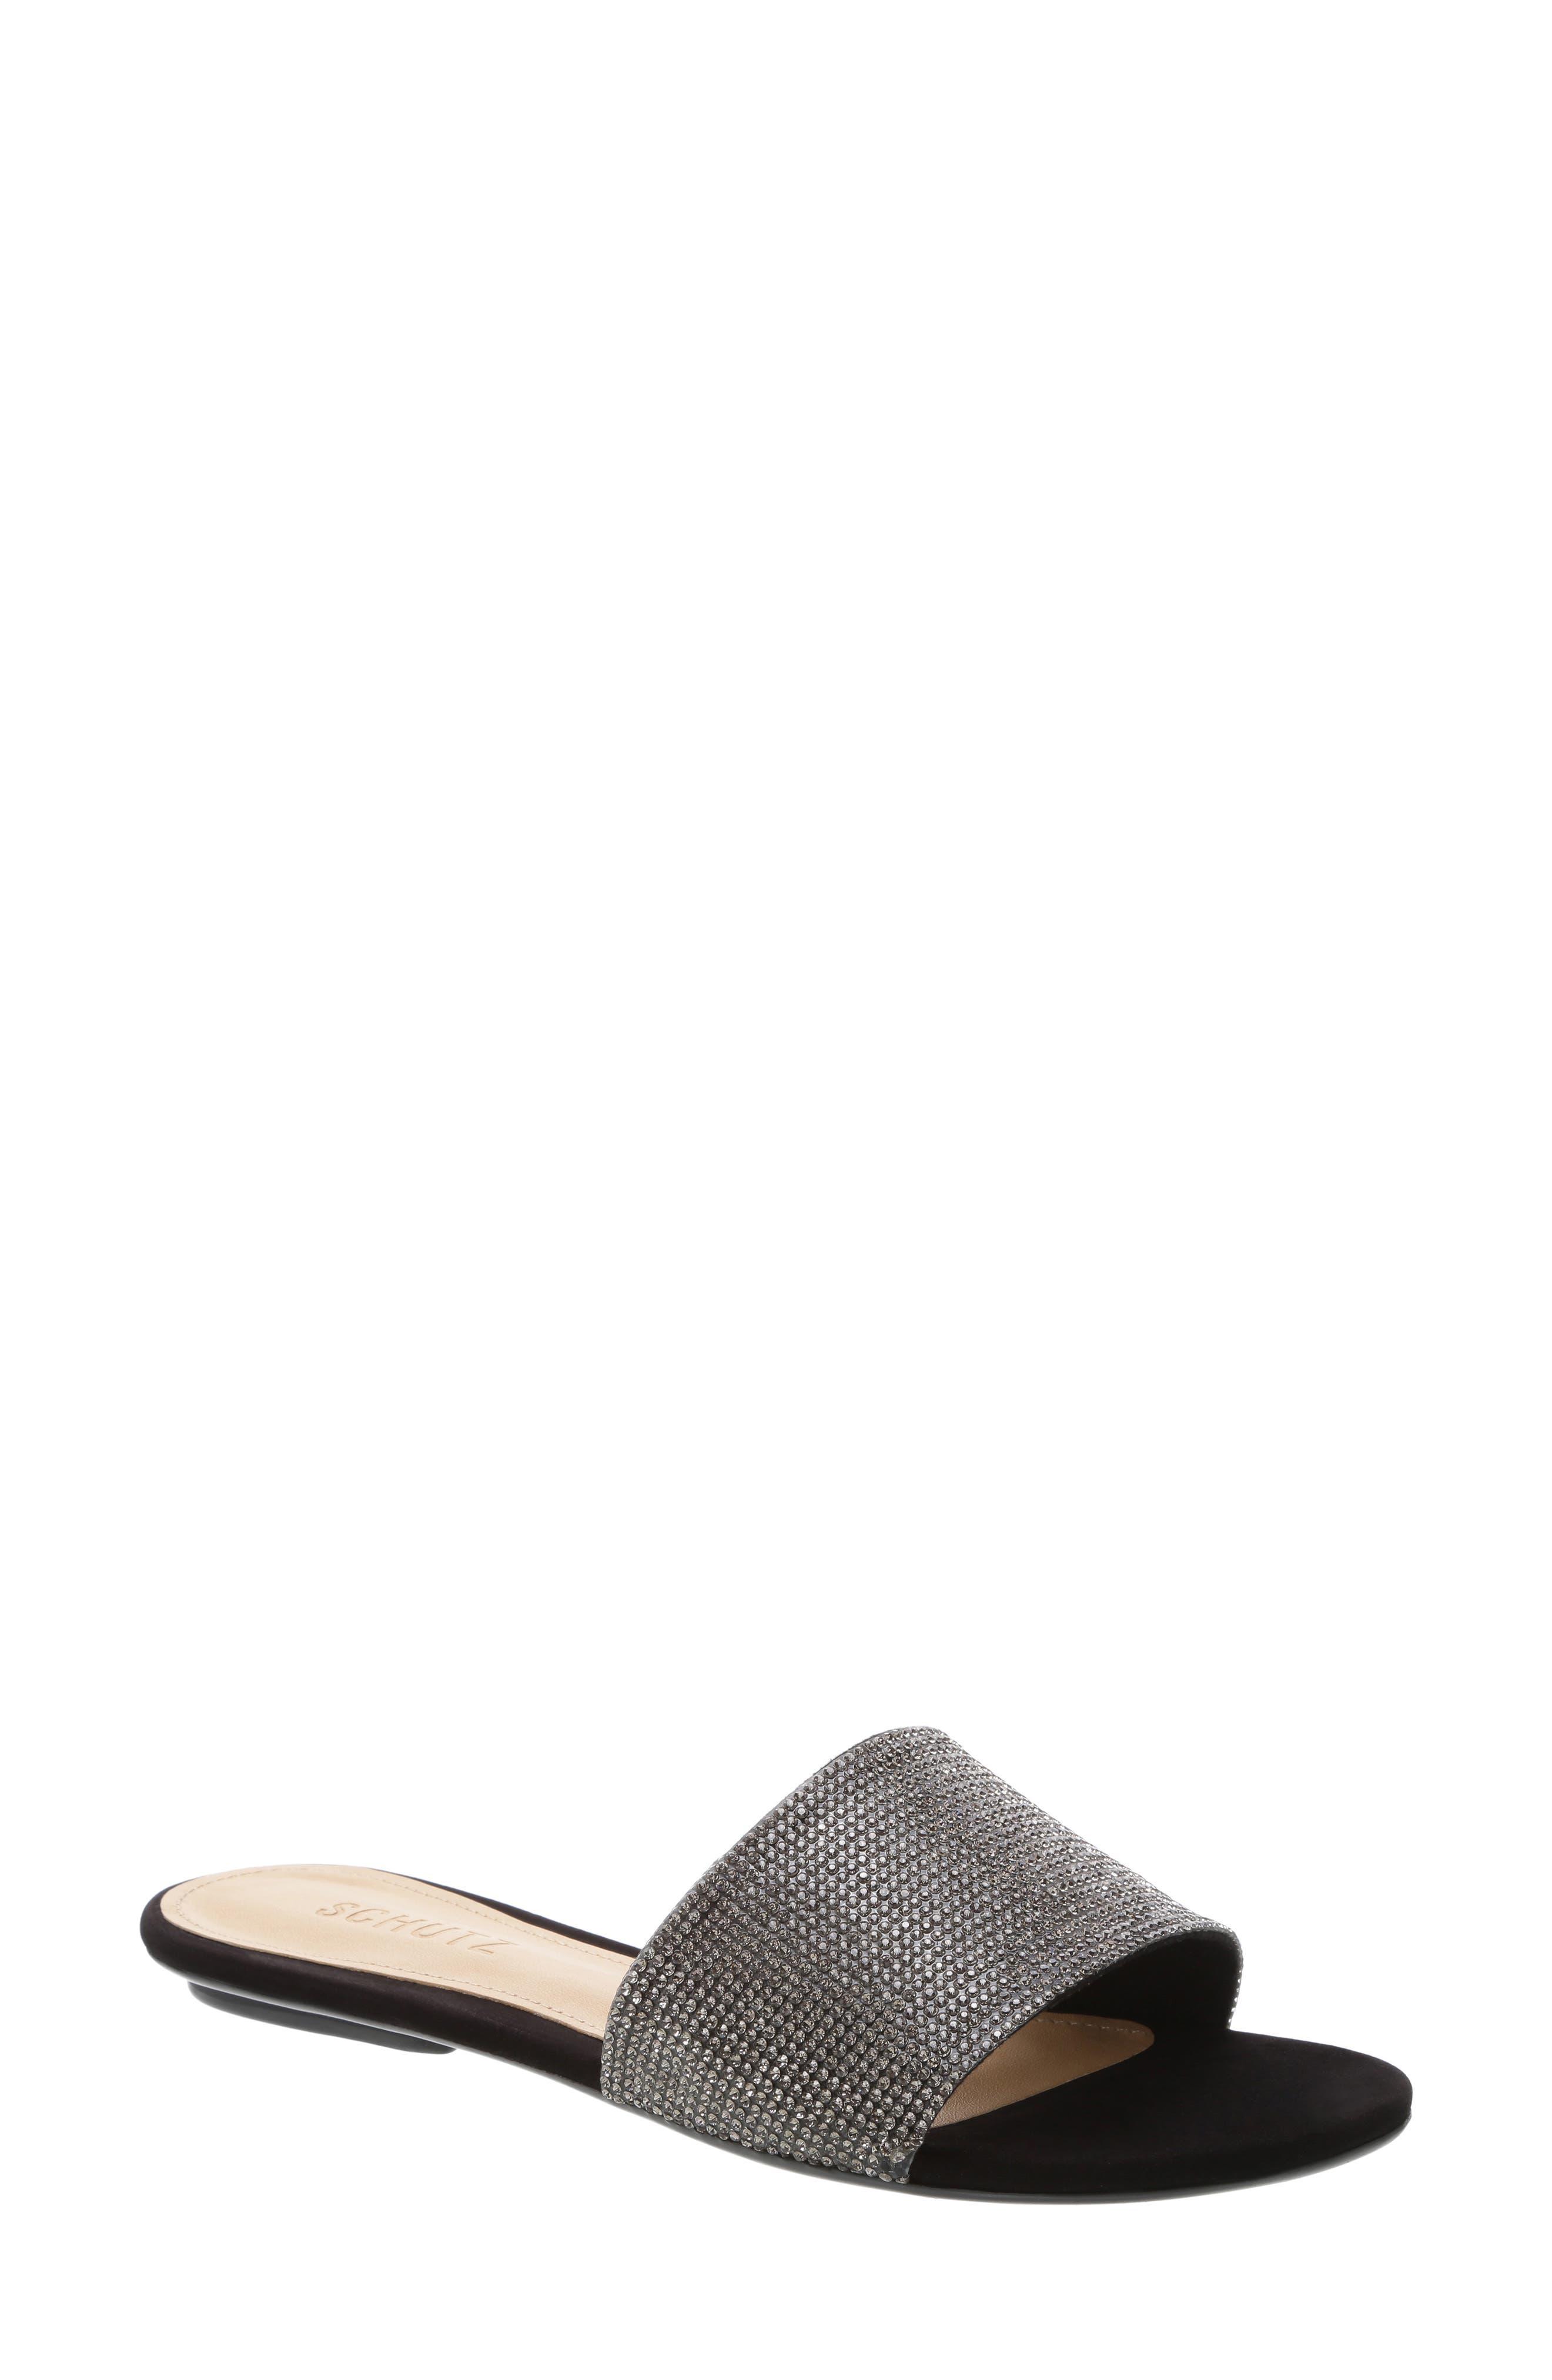 SCHUTZ, Queren Embellished Slide Sandal, Main thumbnail 1, color, BLACK/ BLACK DIAMOND FABRIC